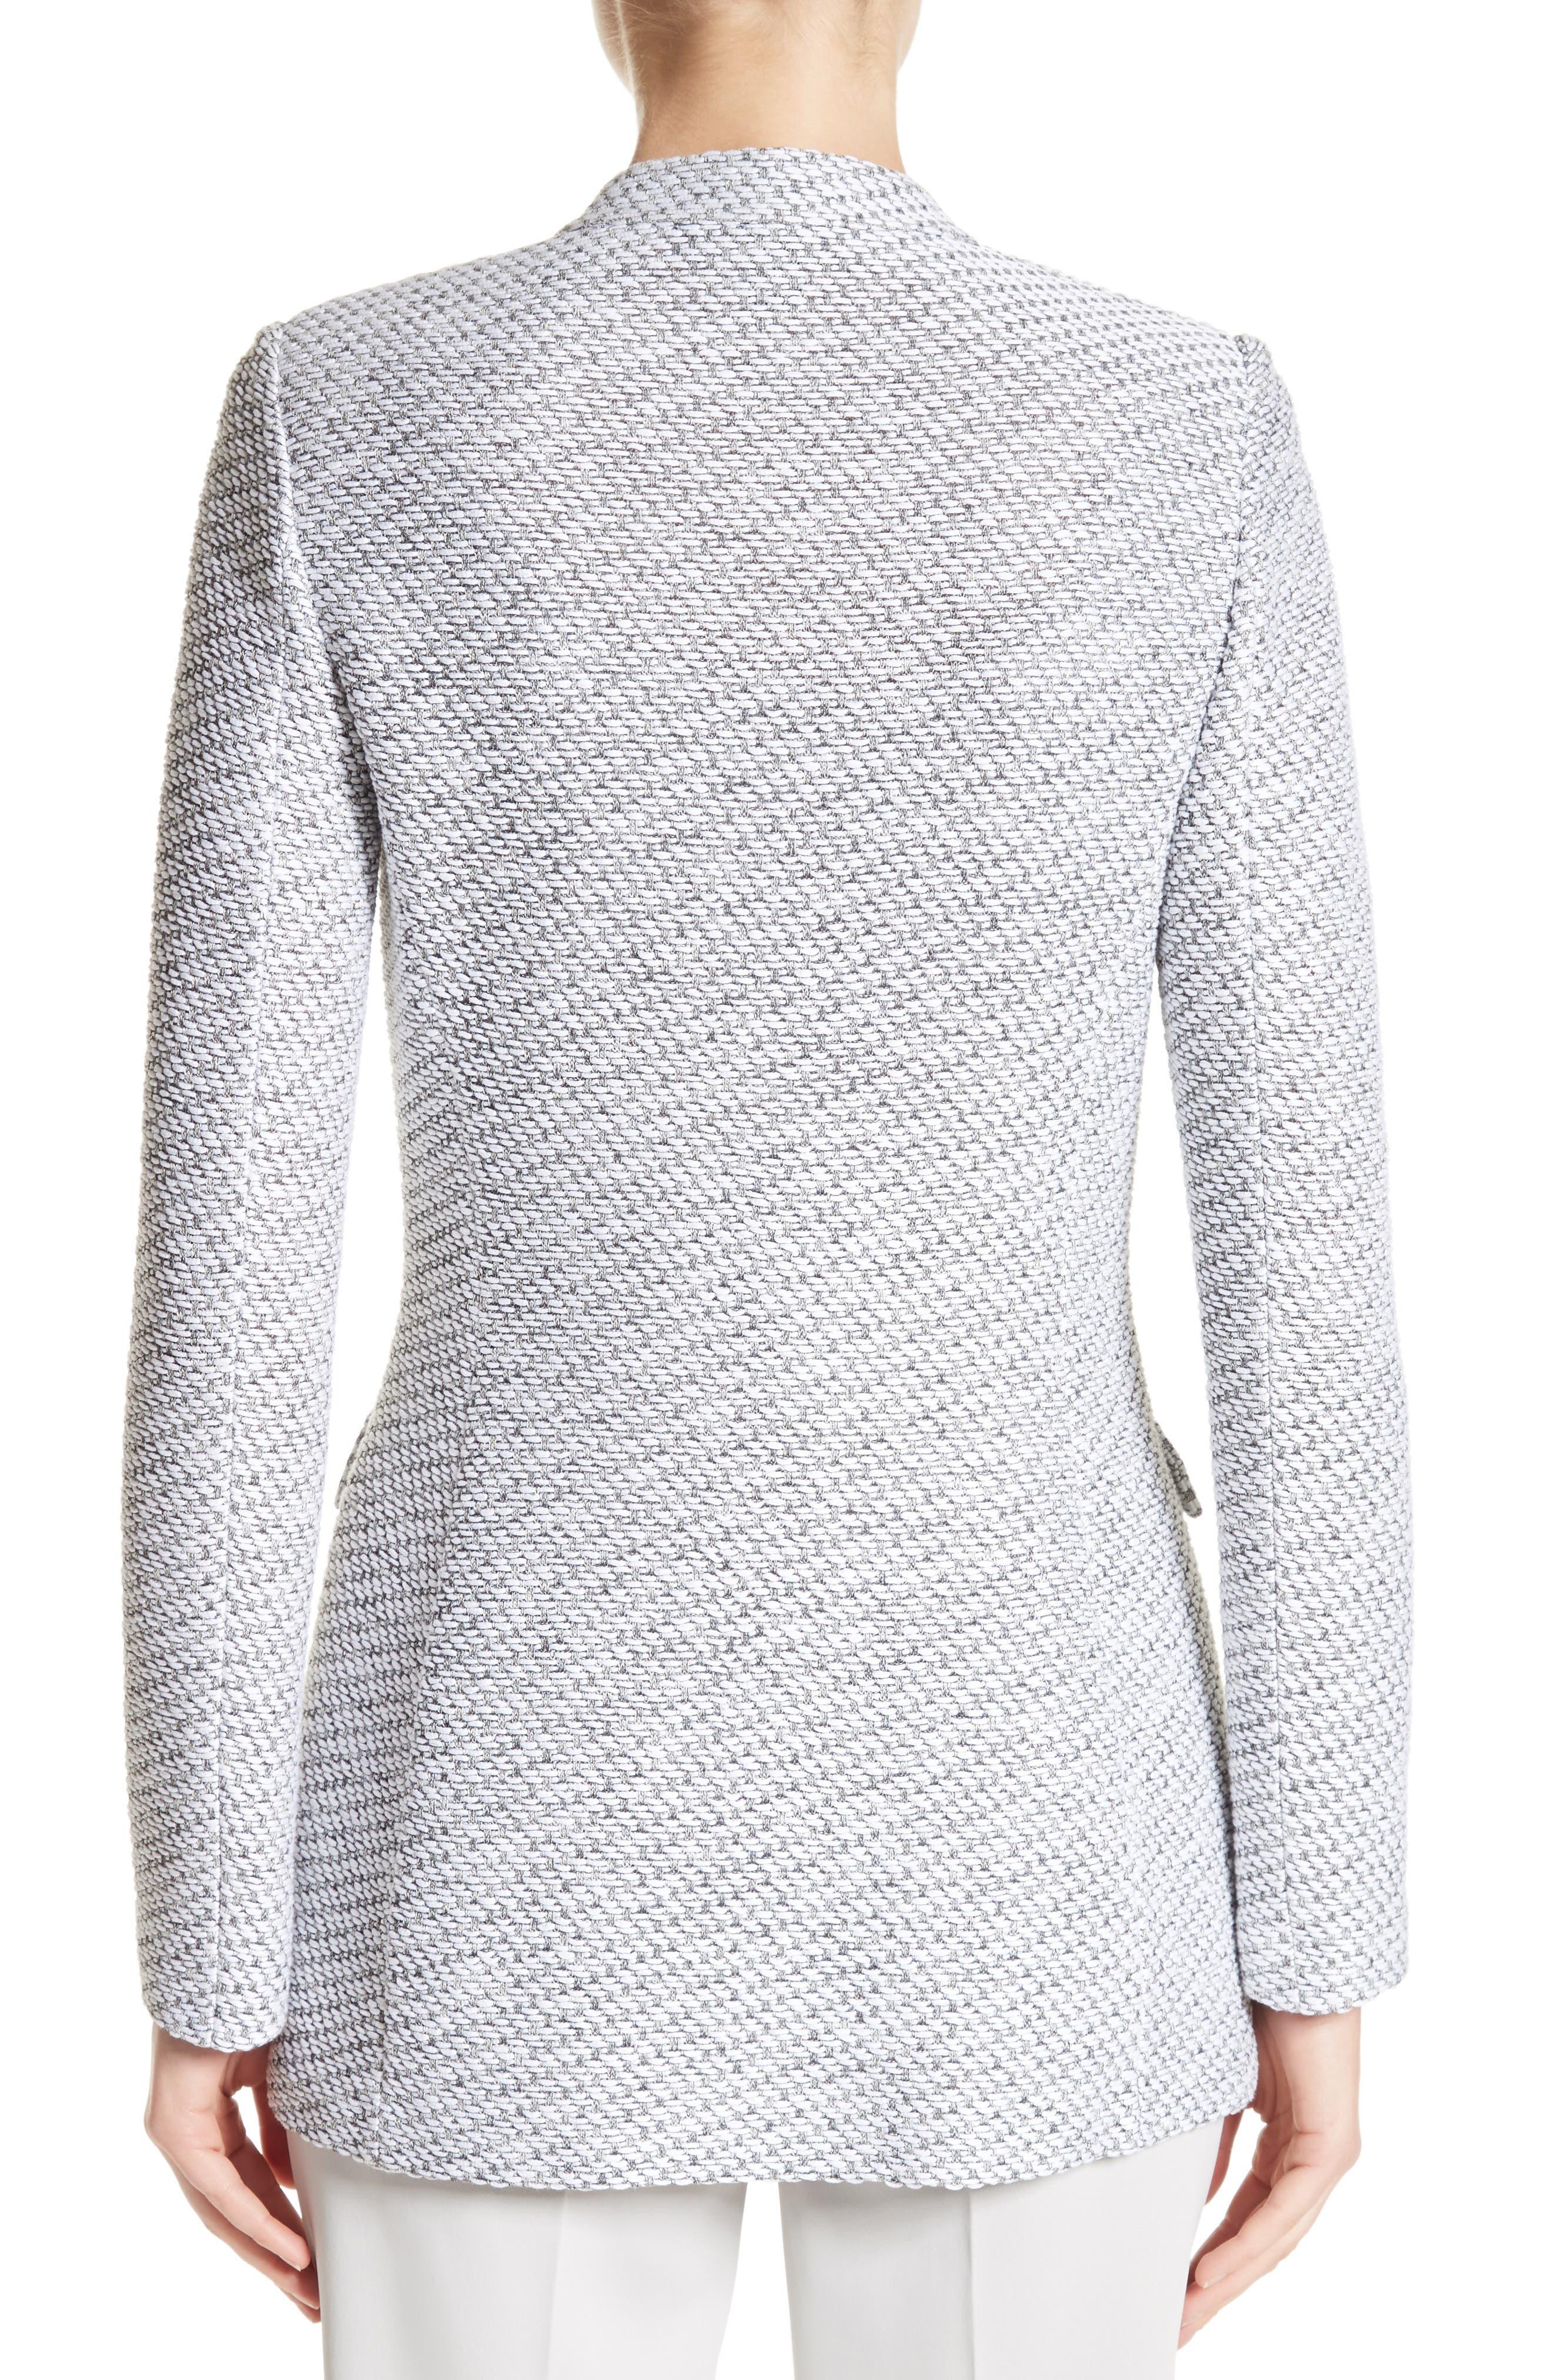 Gyan Knit Jacket,                             Alternate thumbnail 2, color,                             020